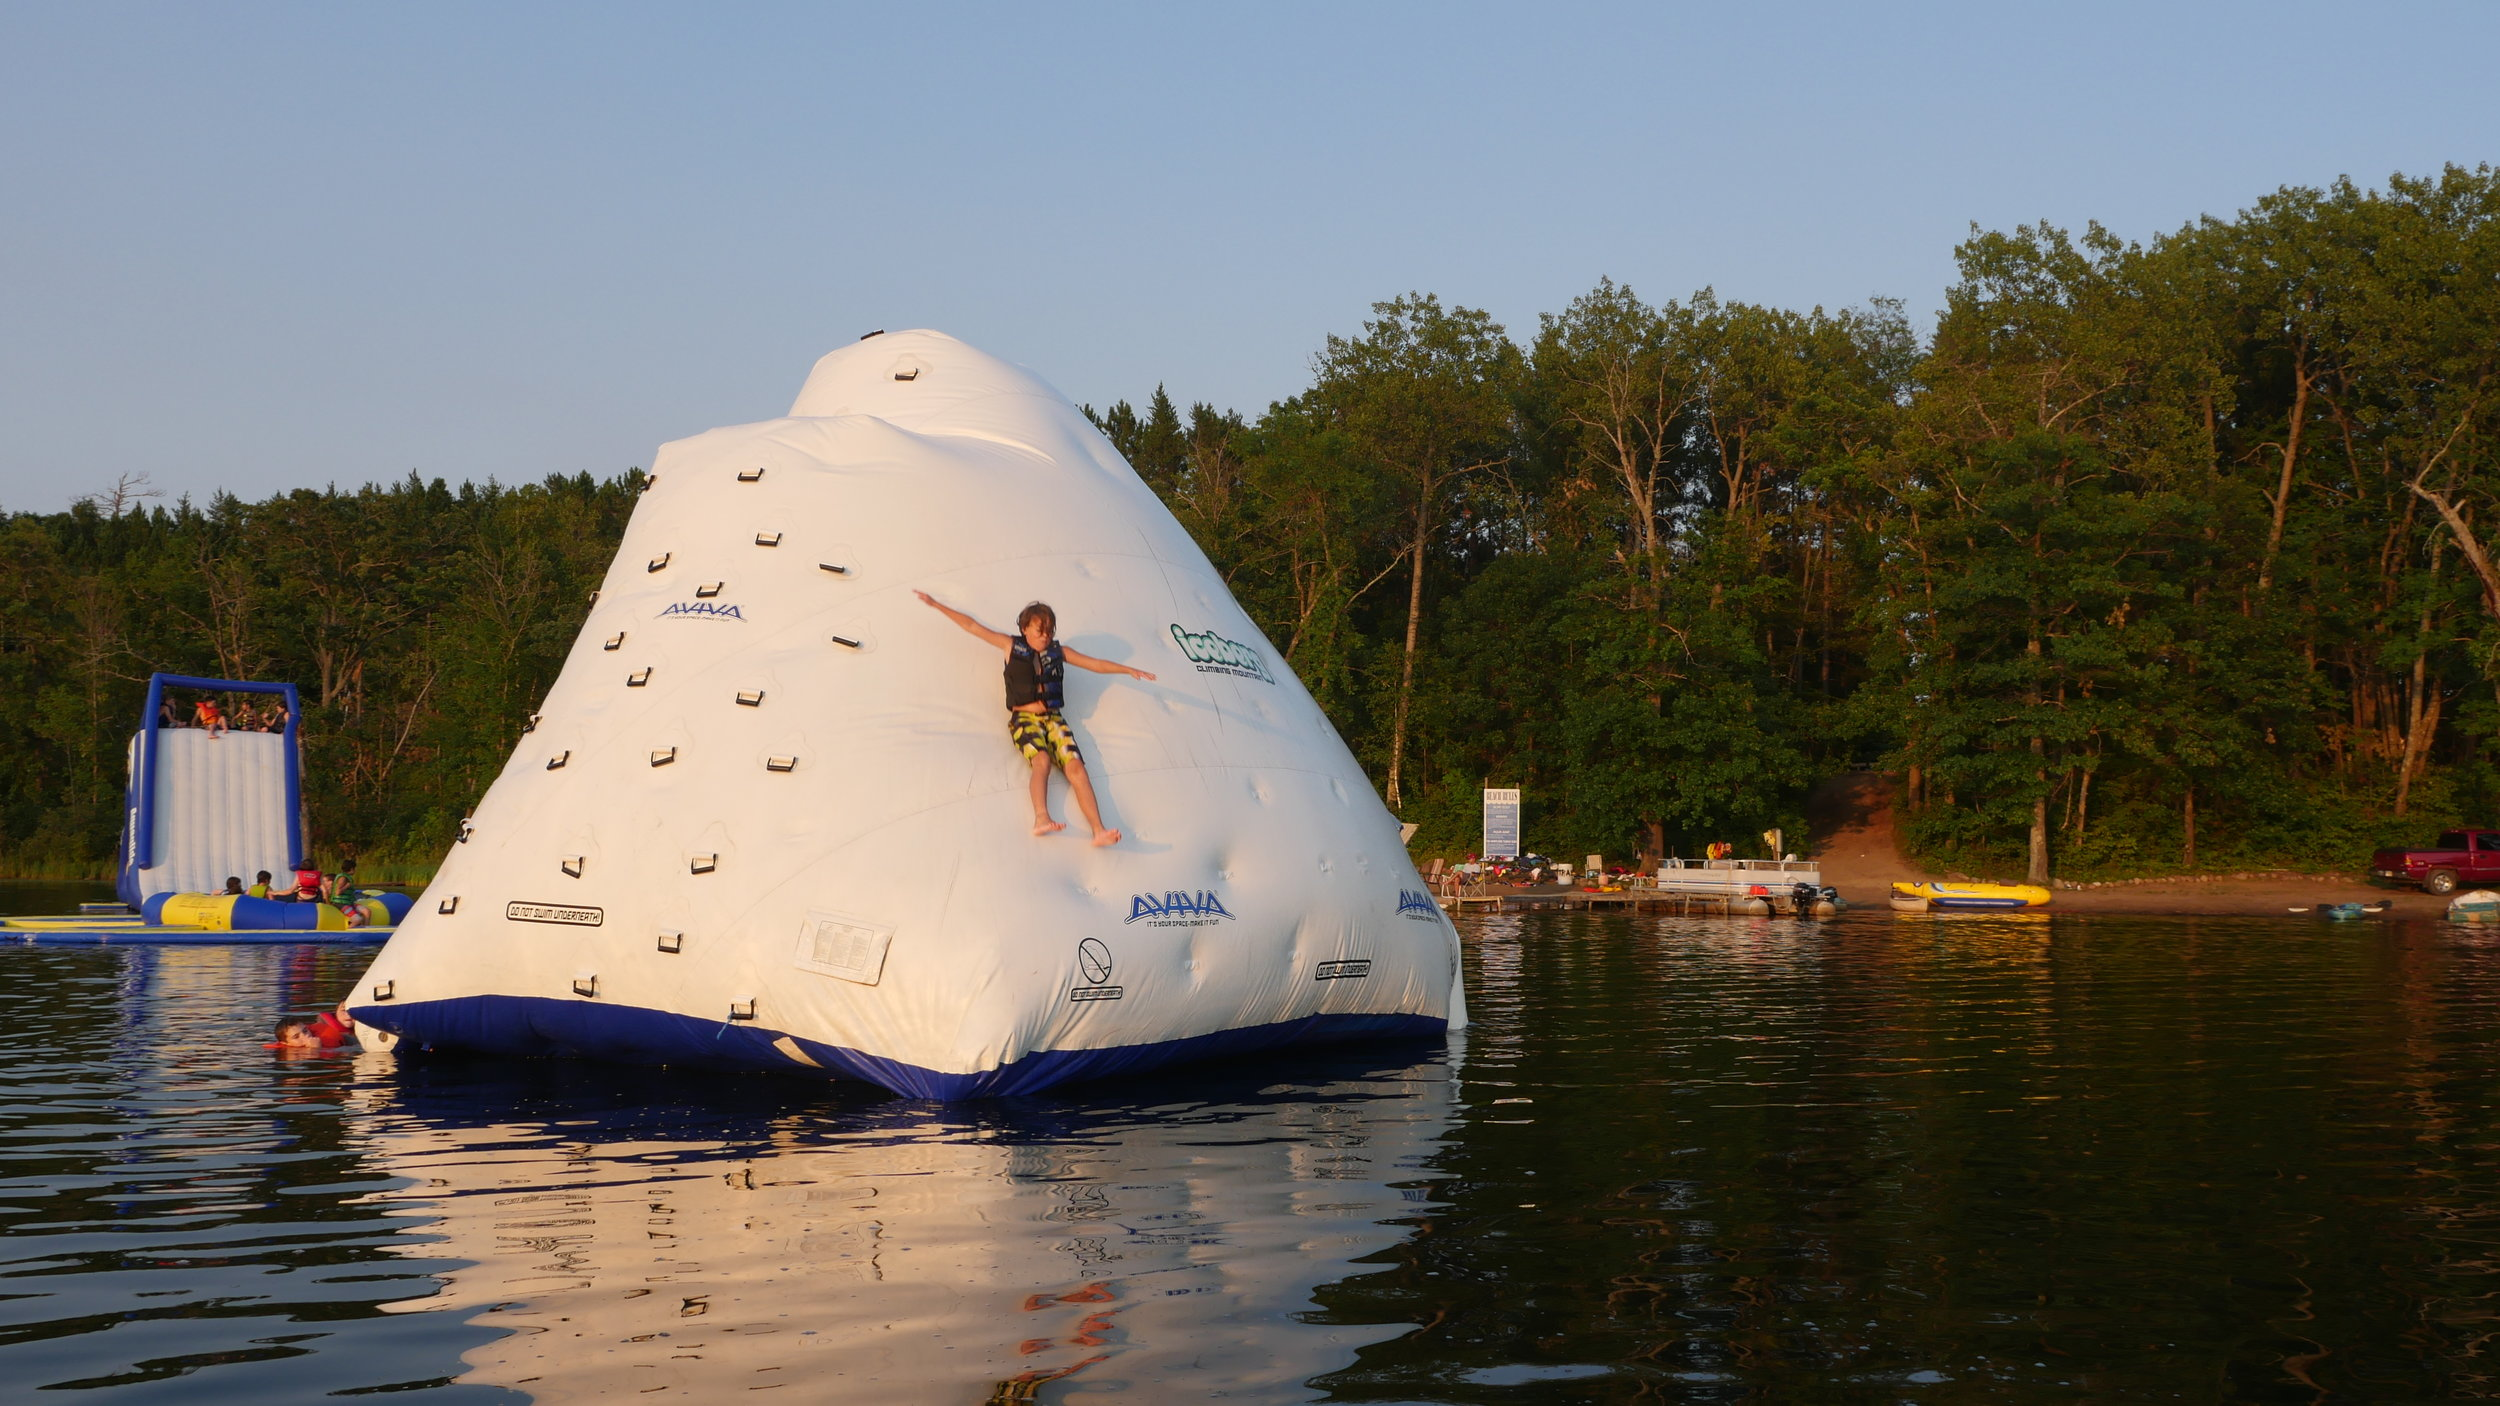 Ice-Berg-Lake-Raft.JPG